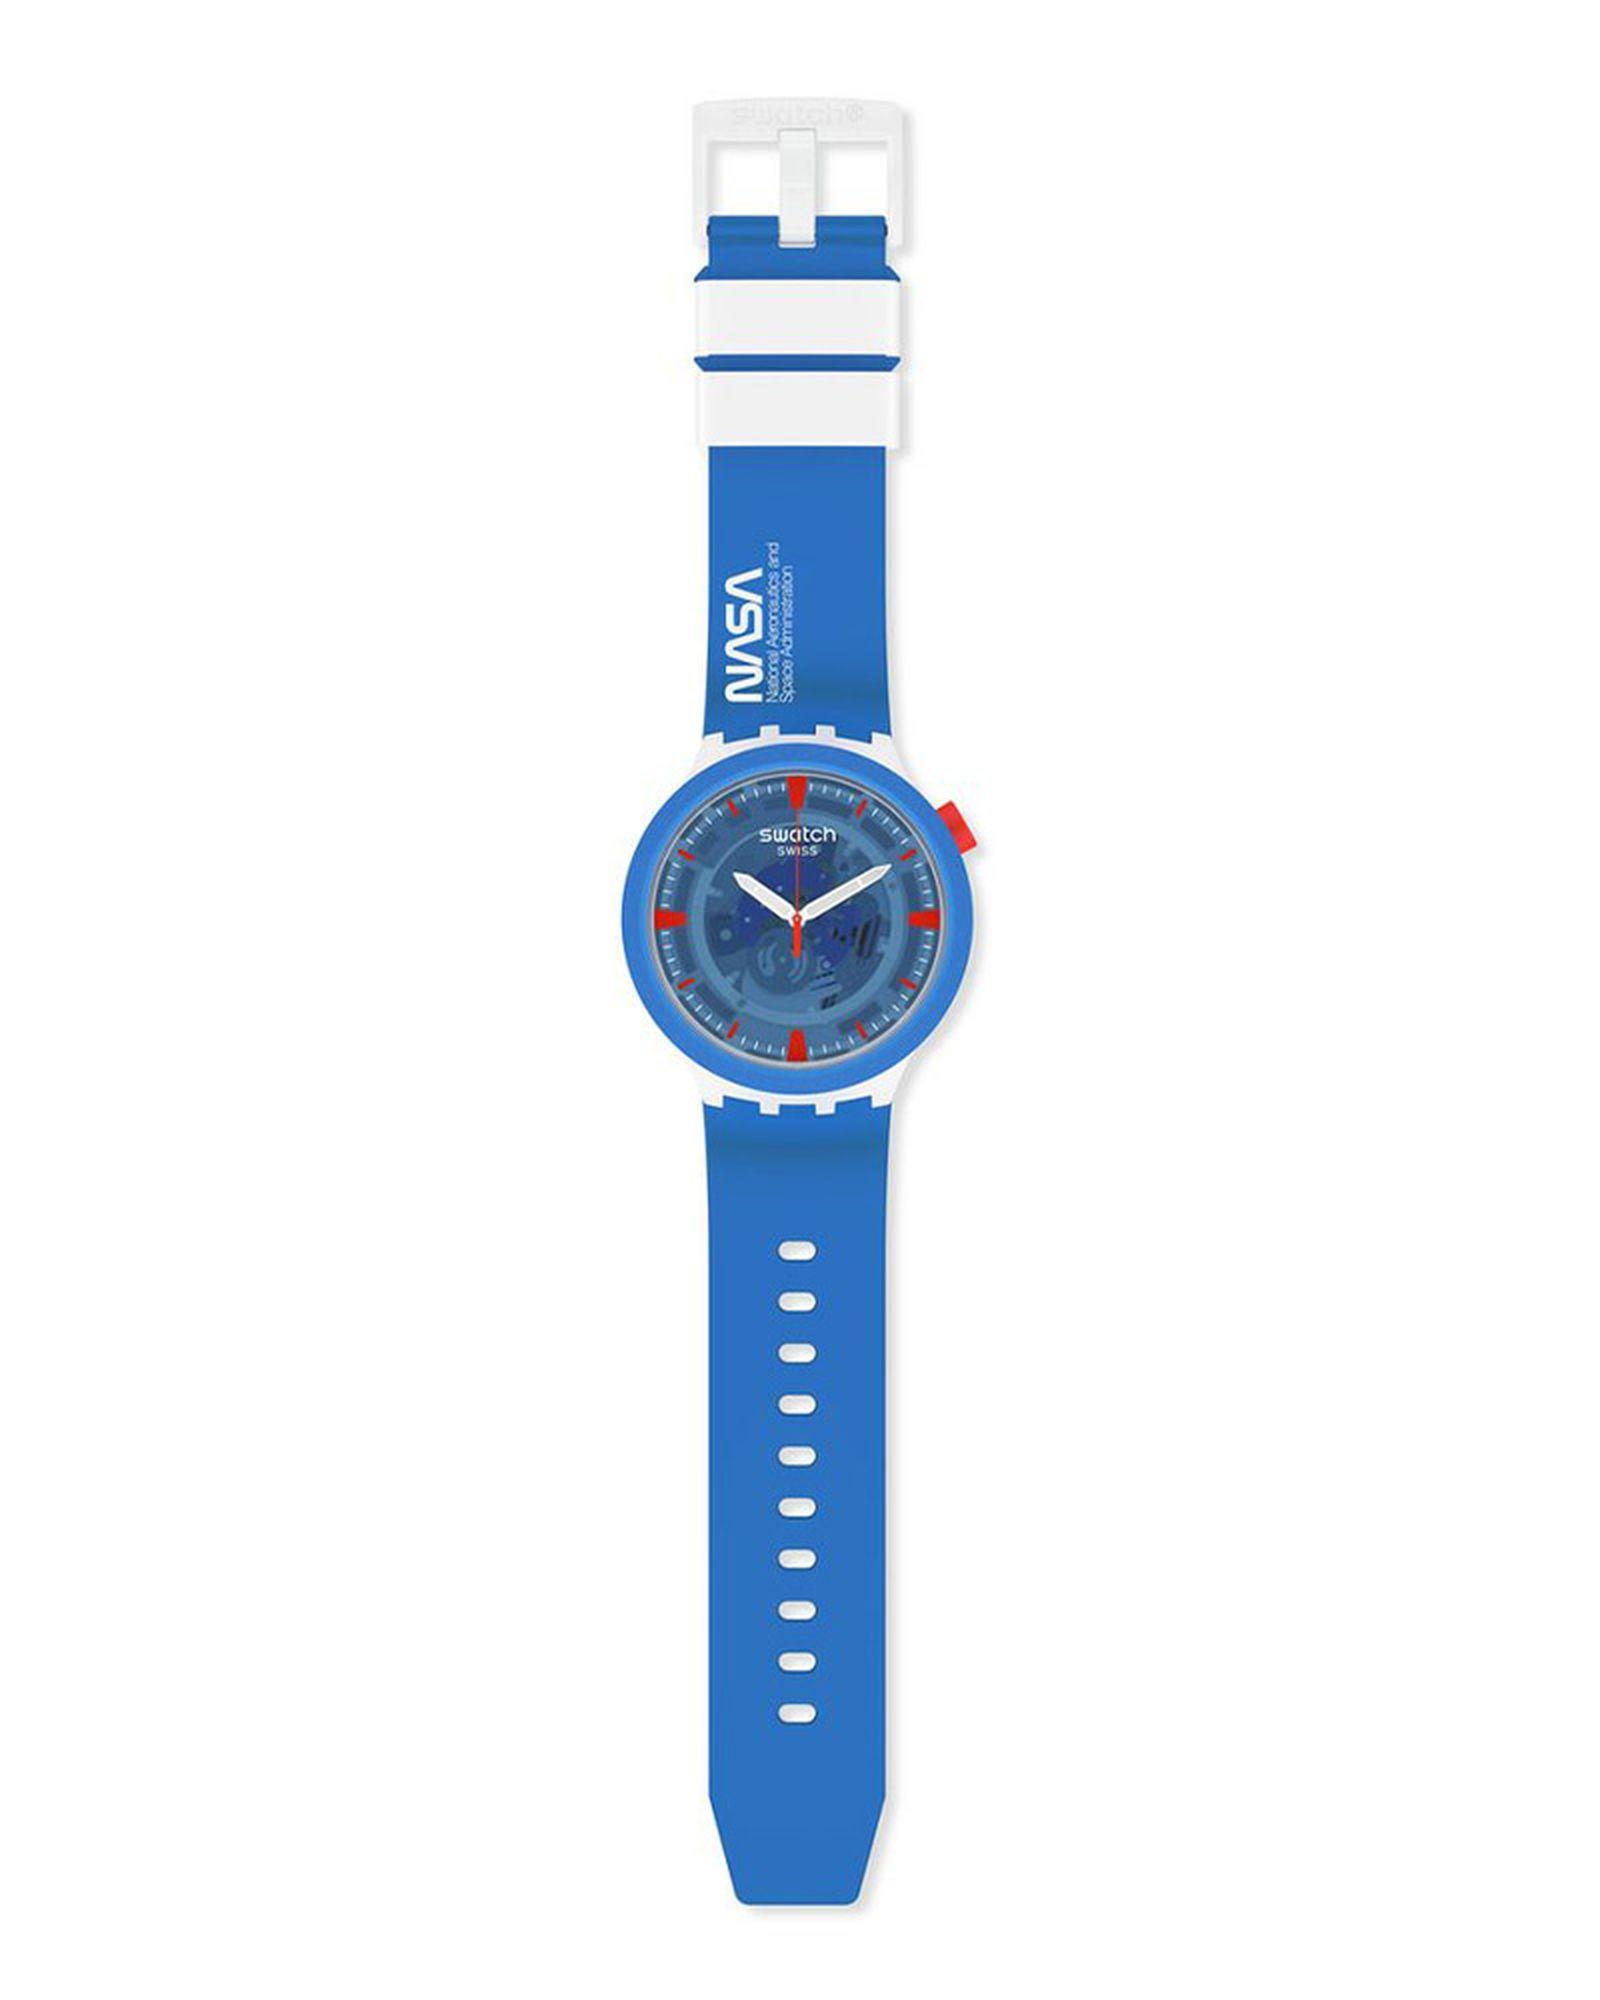 swatch-nasa-watch-02